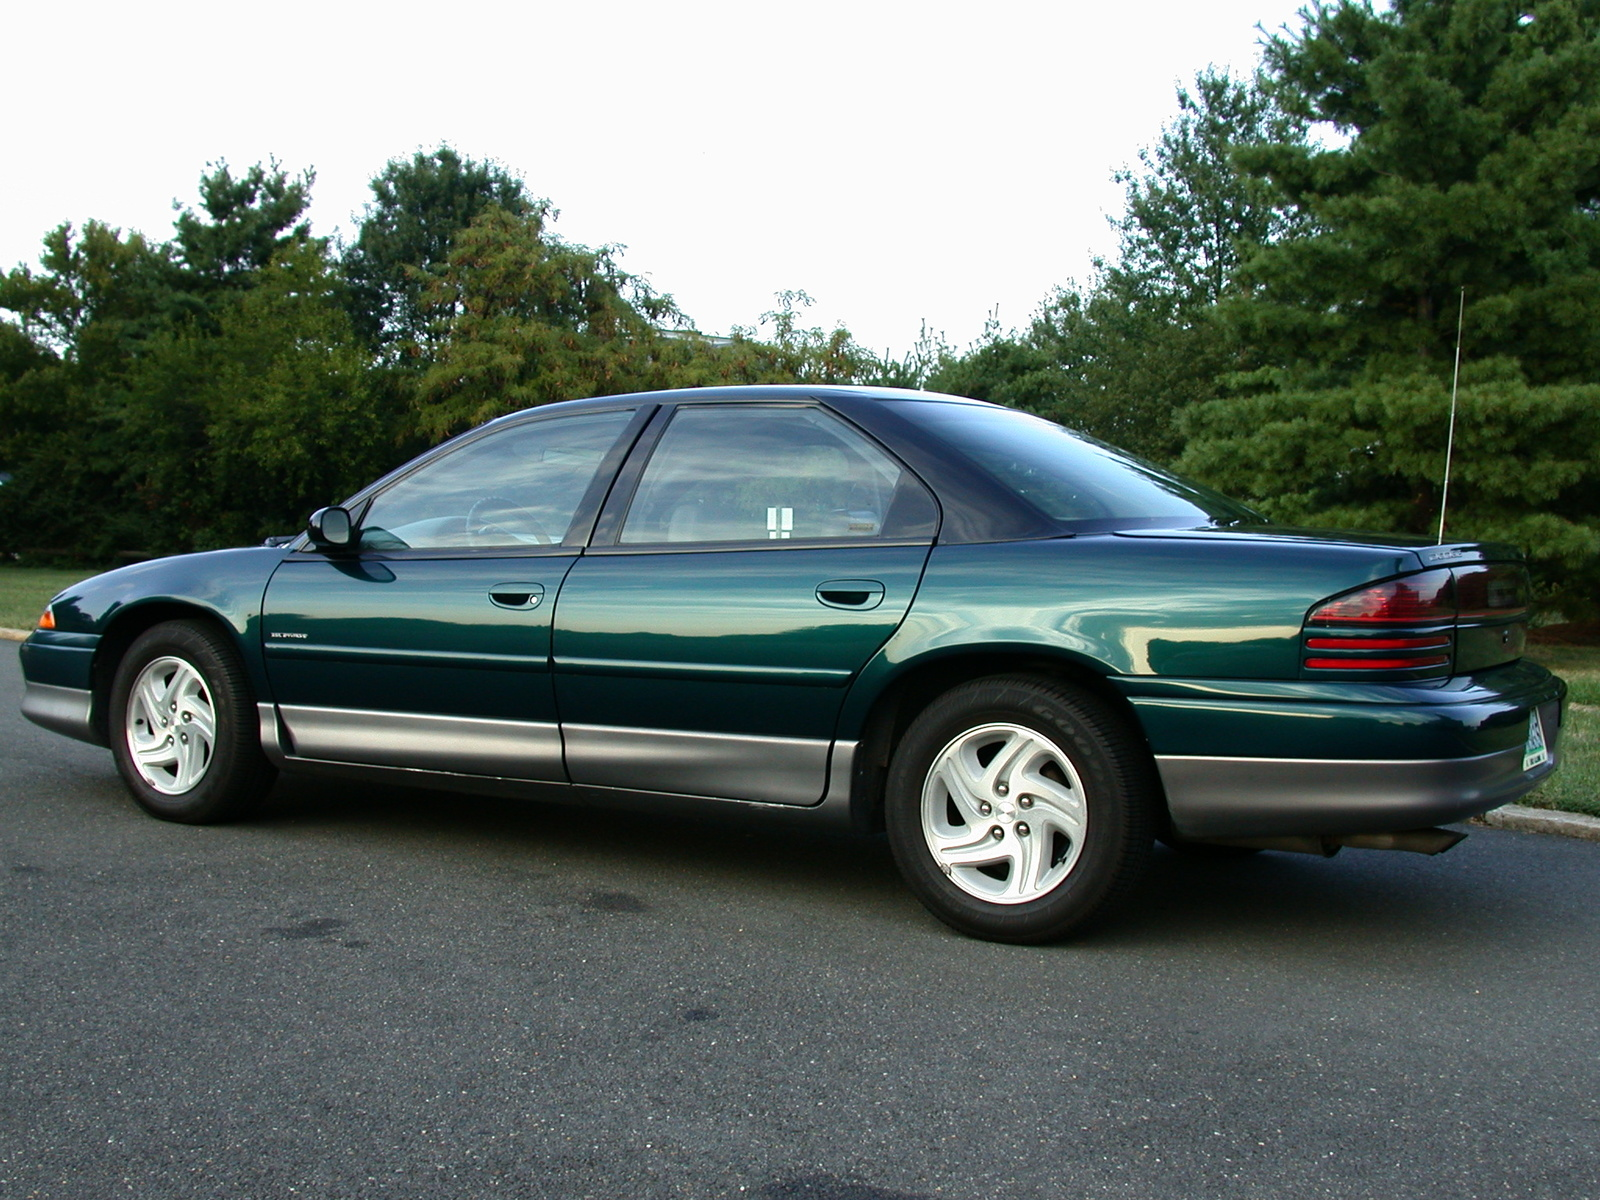 Dodge Intrepid 1994 foto - 1